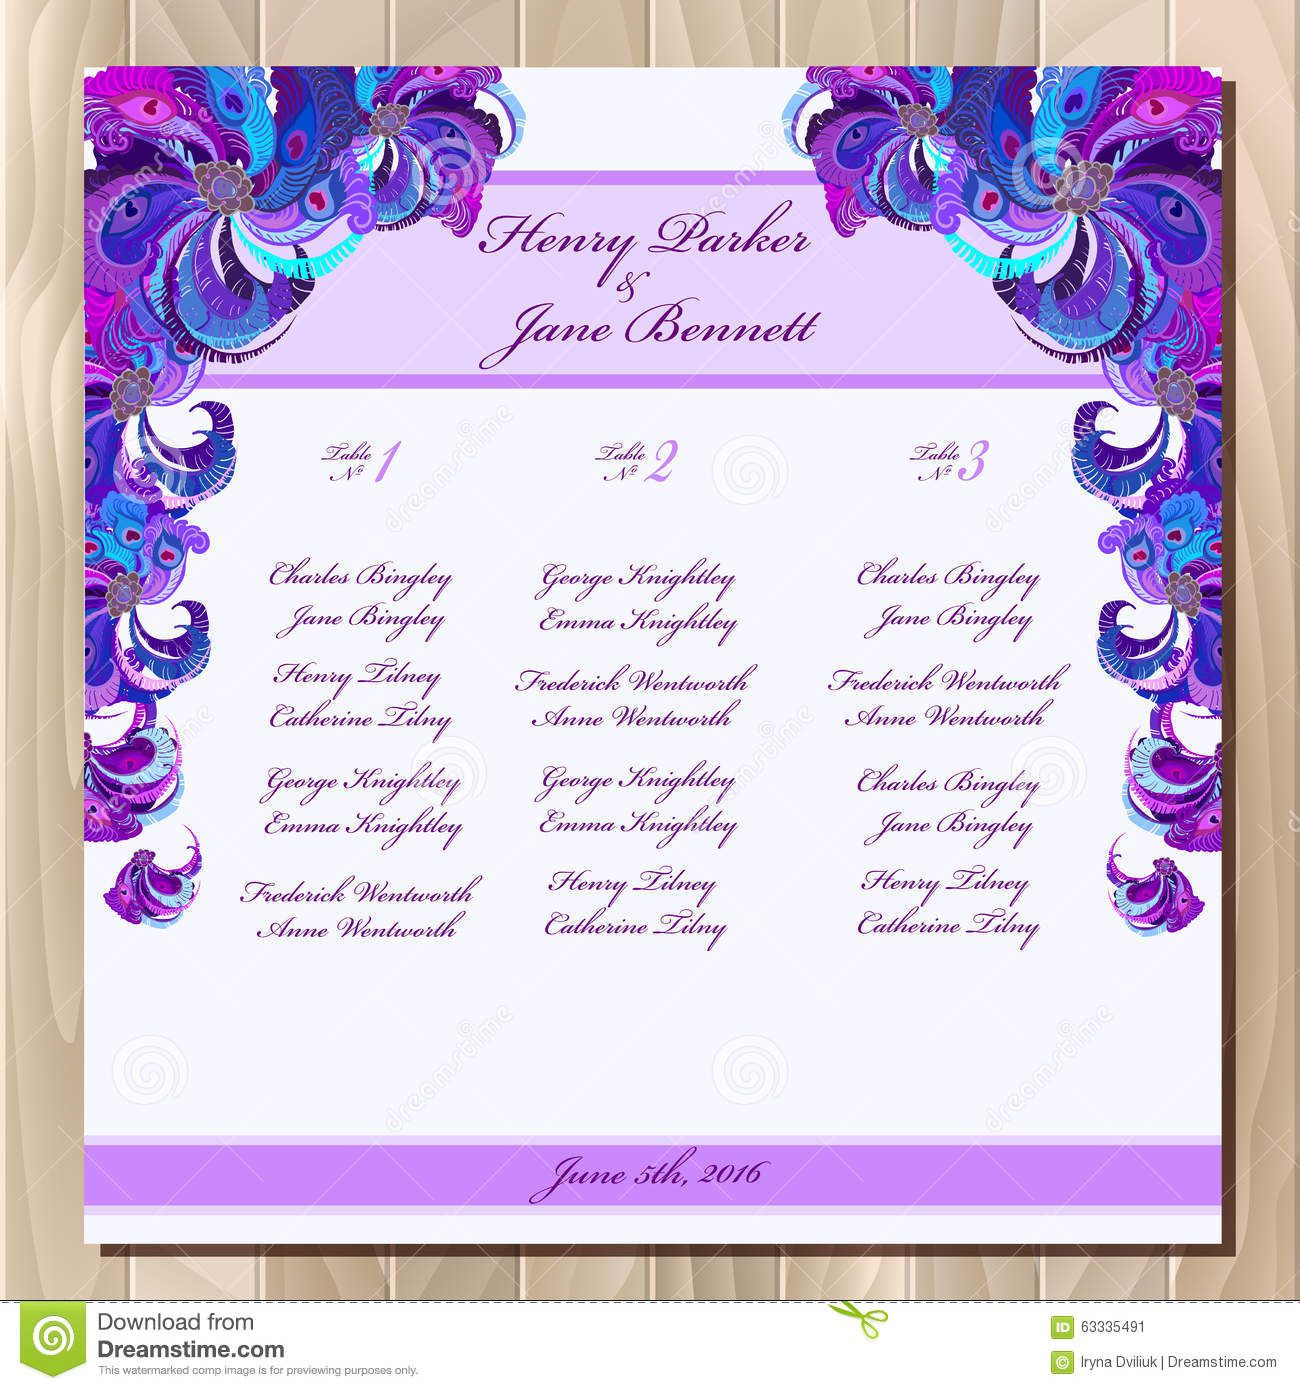 003 Surprising Wedding Guest List Excel Spreadsheet Template Highest Clarity Full